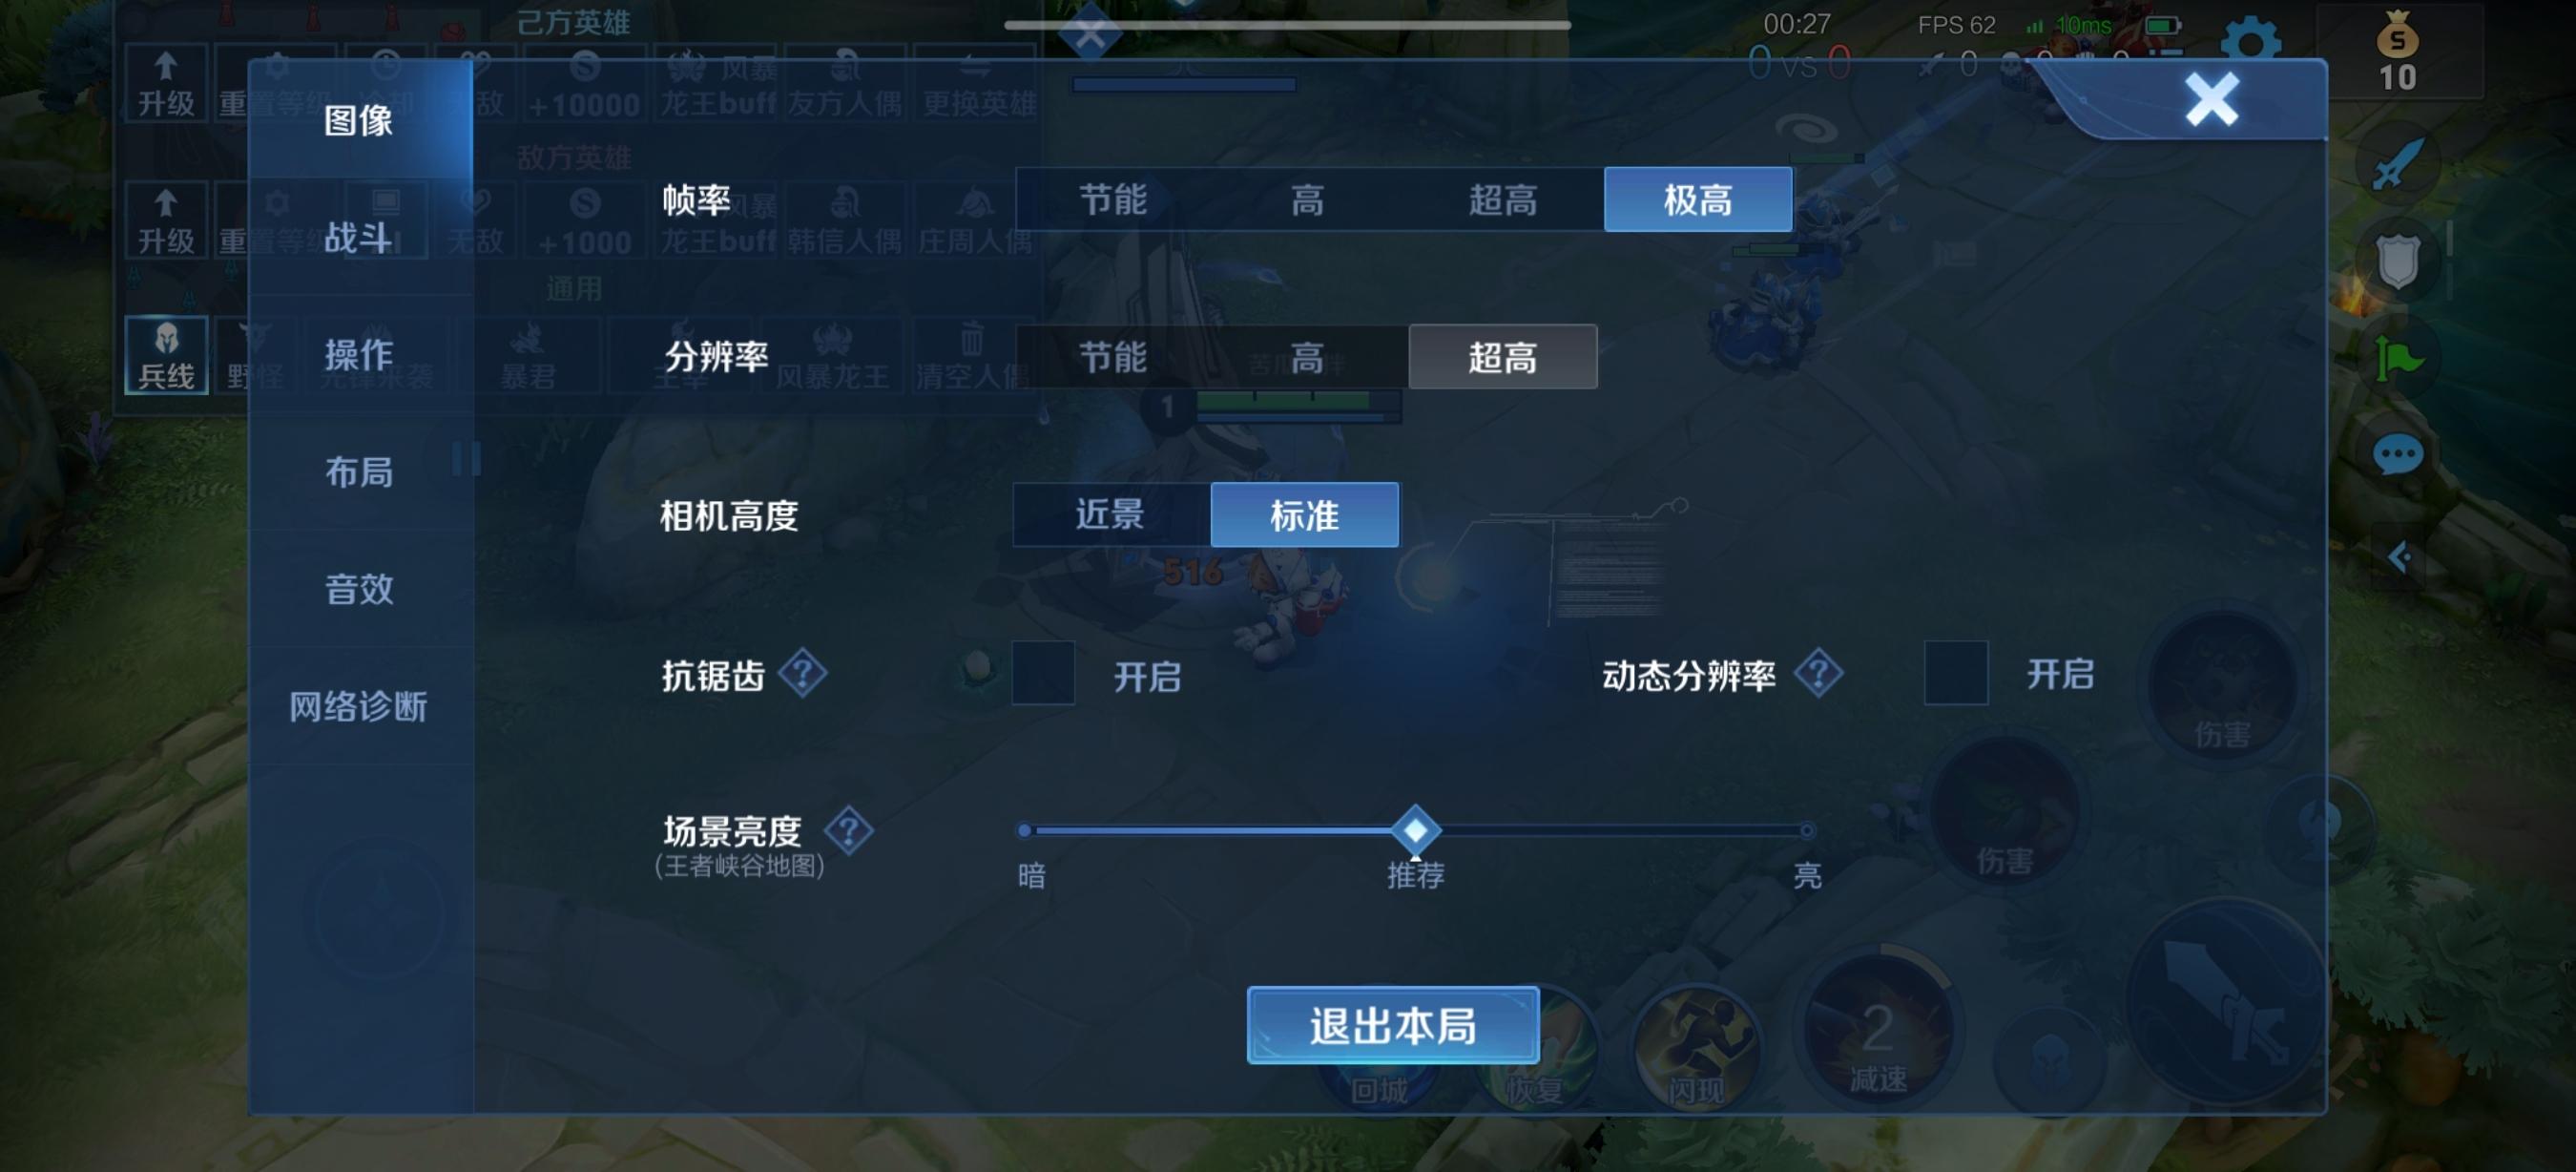 Screenshot_20211014_172204_com.tencent.tmgp.sgame.jpg